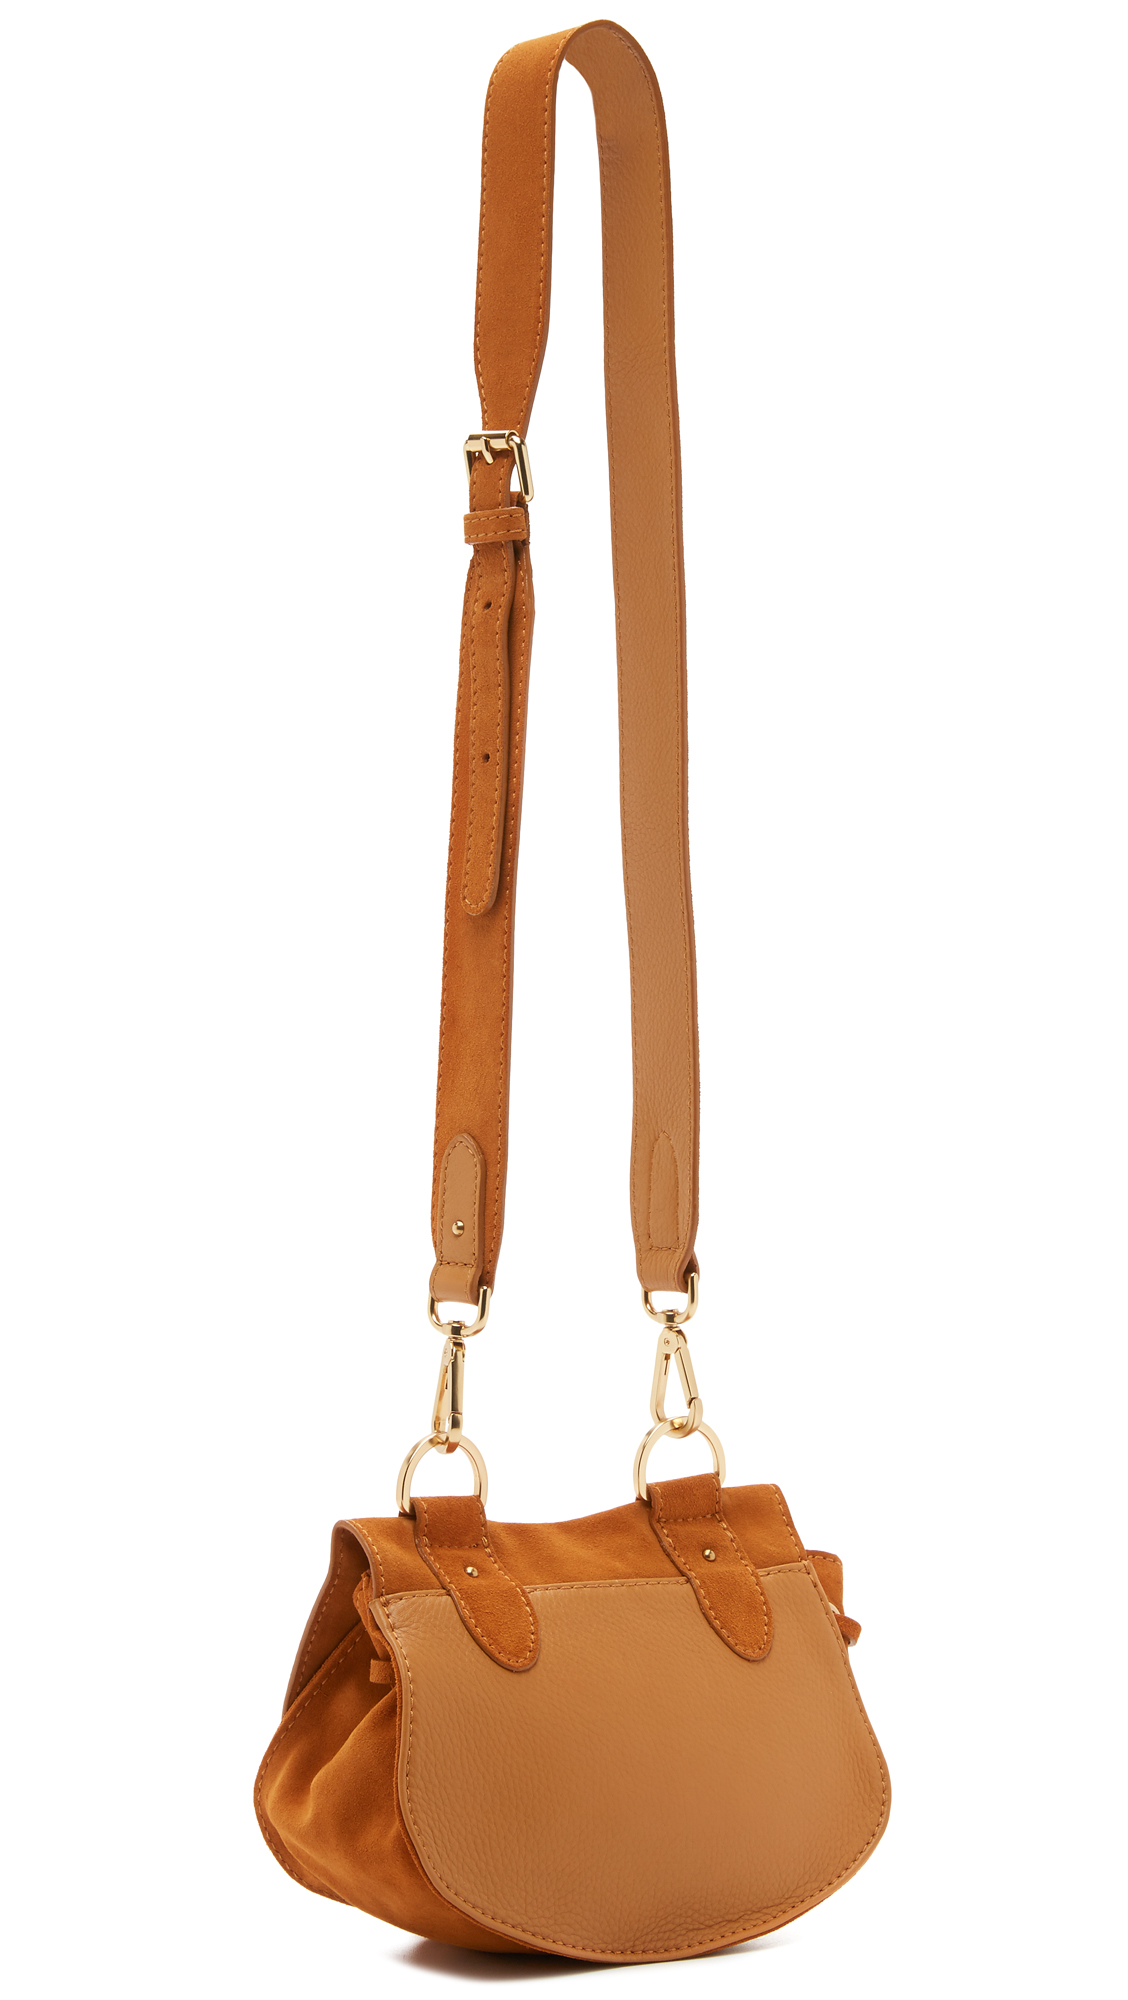 bcaed14eaef1 See by Chloe Collins Mini Saddle Bag